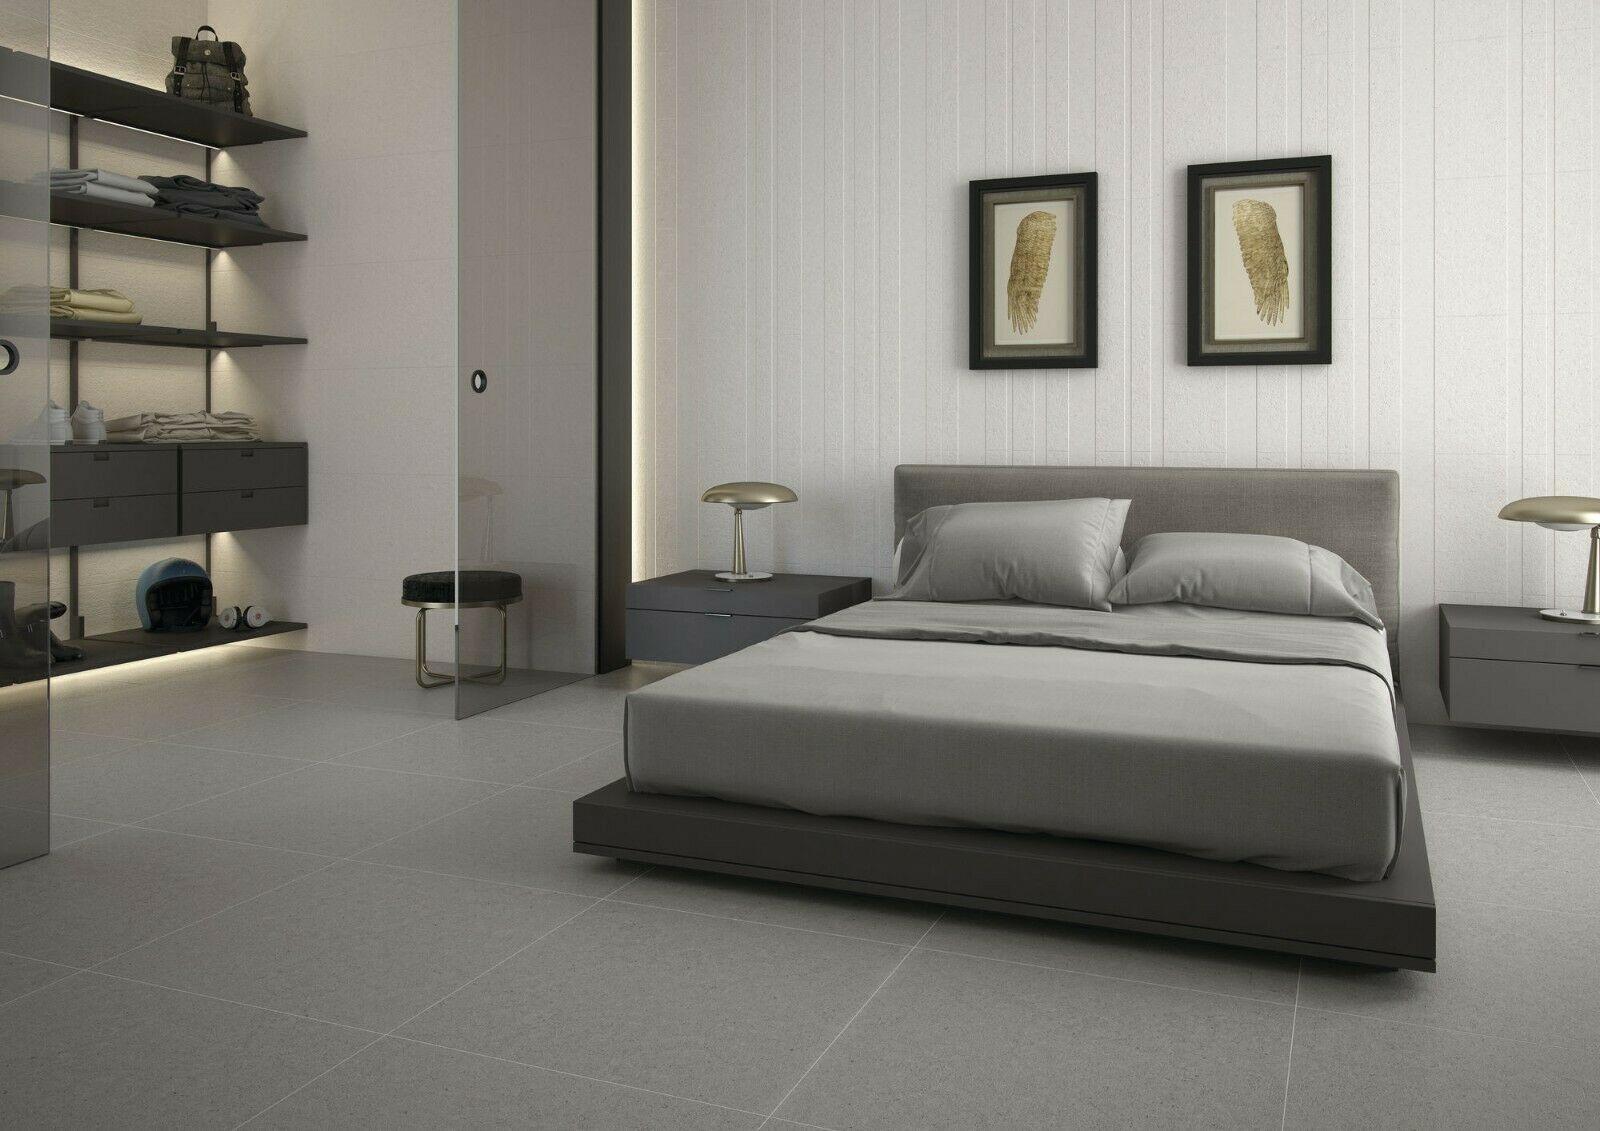 Modern White And Grey Master Bed Google Search Minimalist Bedroom Contemporary Bedroom Design Minimal Bedroom Design